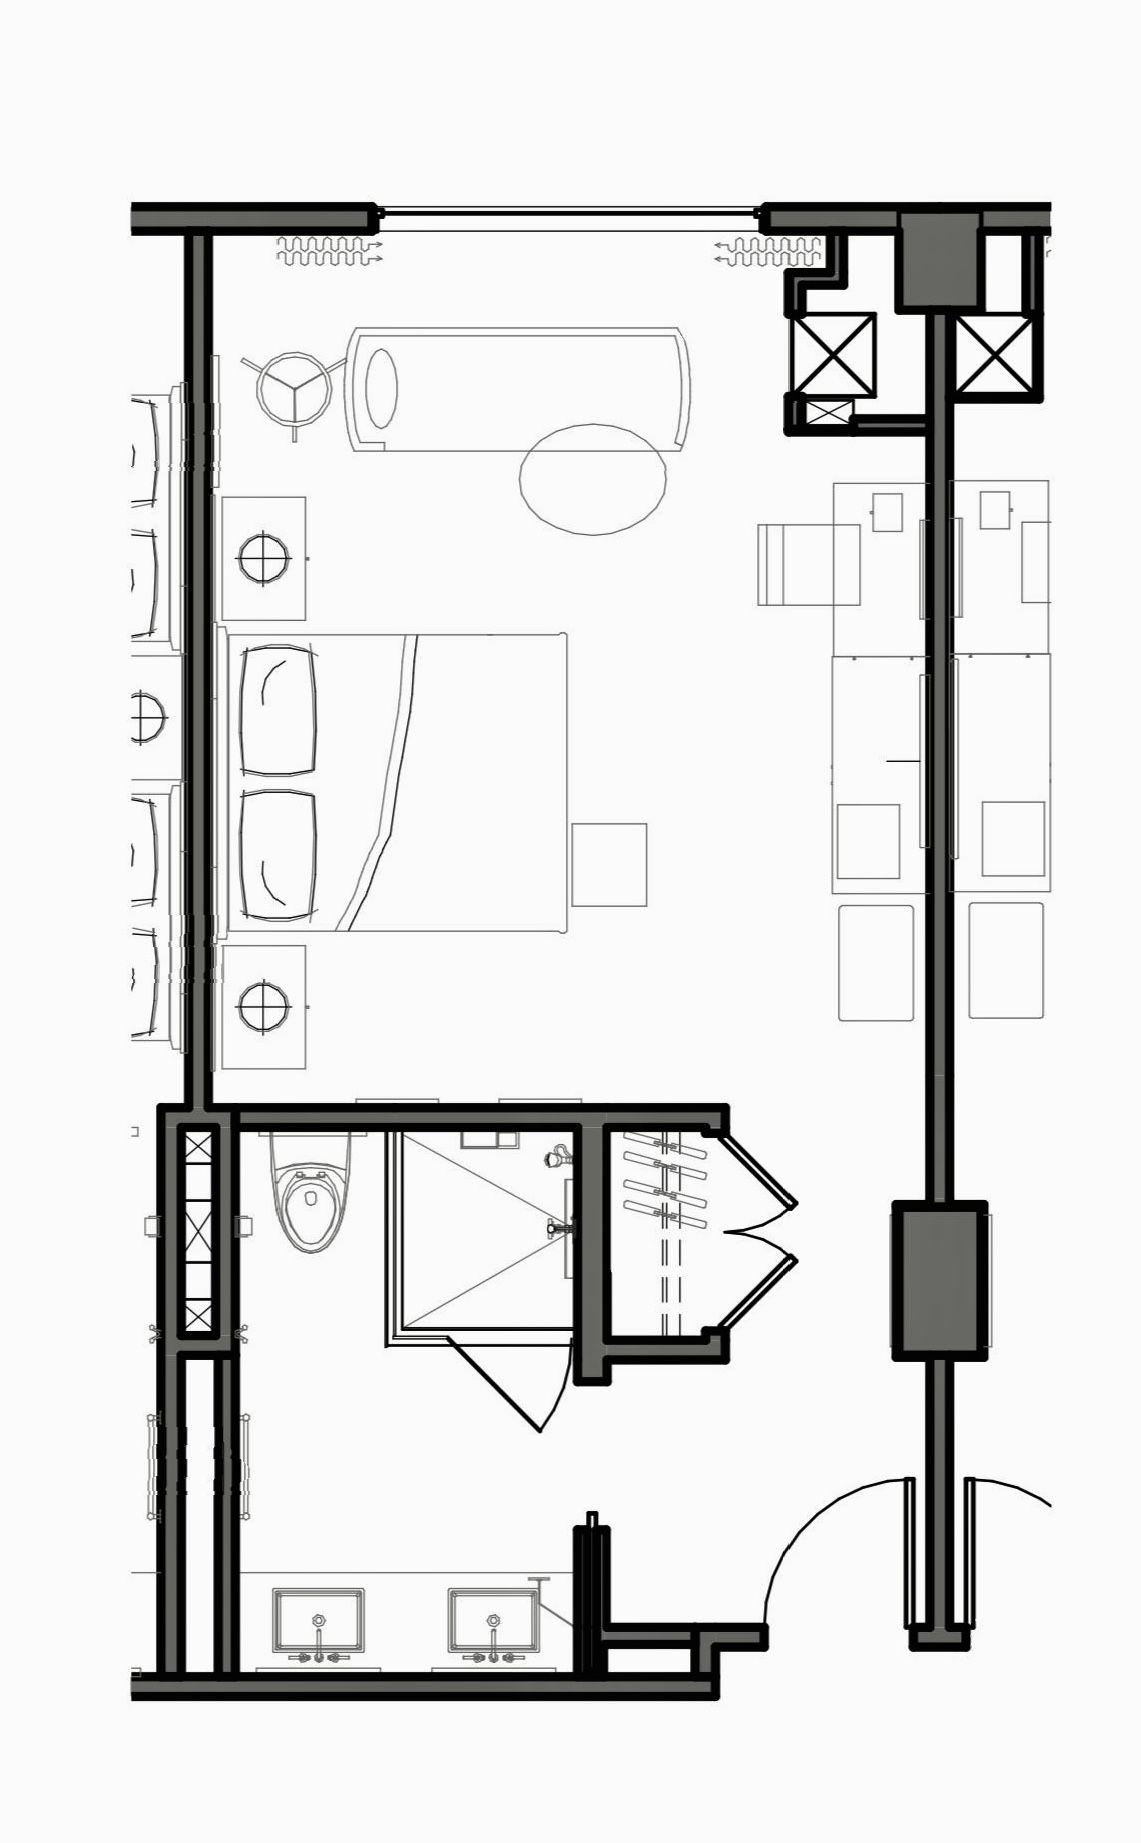 Pin On Floor Plan Hotel Room